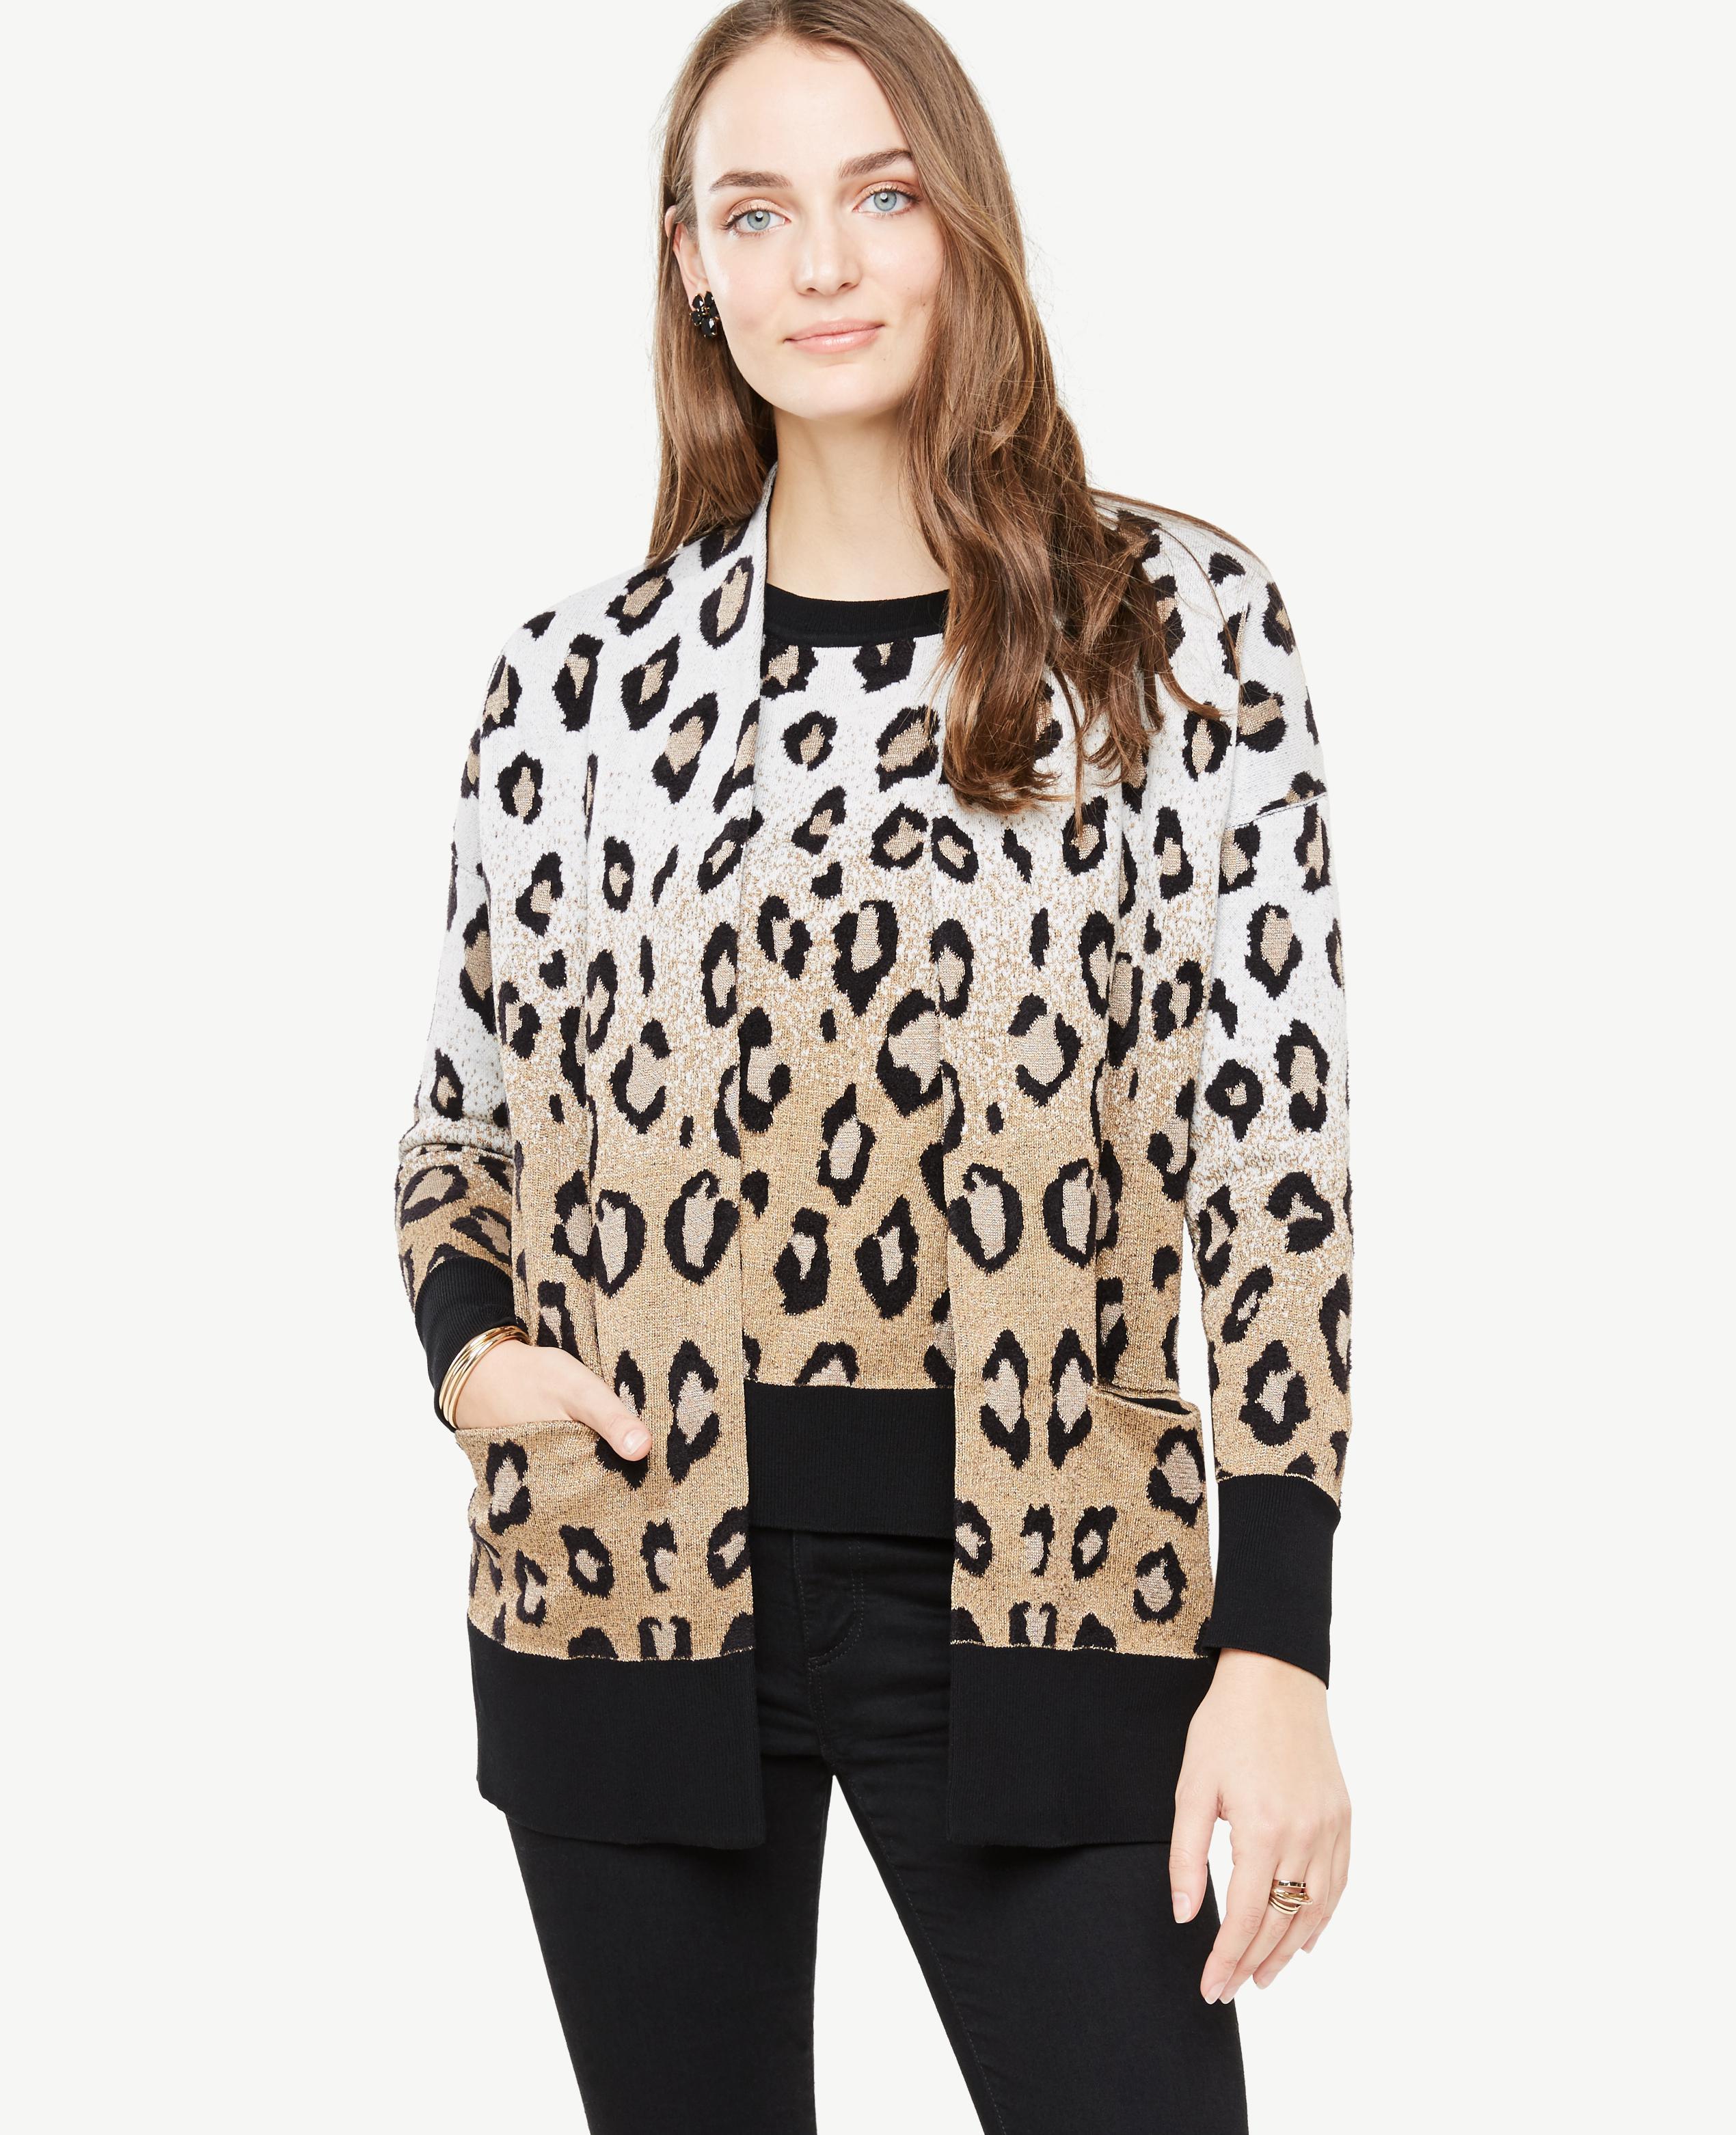 9ef9759fbfb9cd Ann Taylor Petite Leopard Pocket Cardigan - Lyst